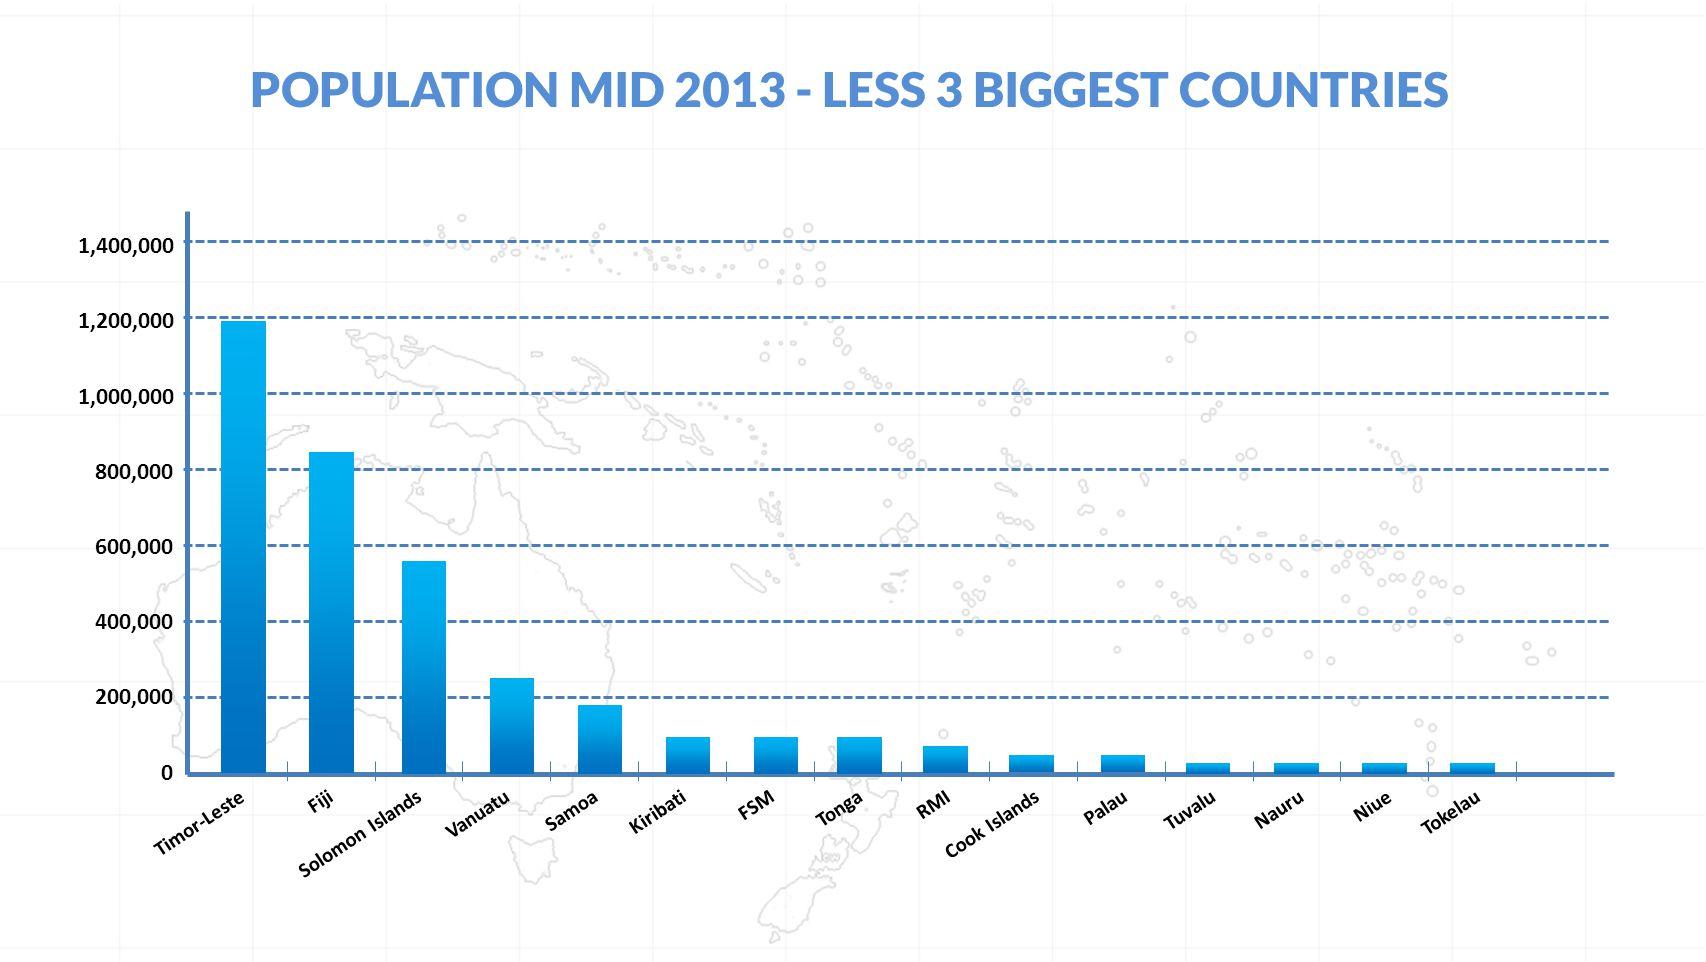 POPULATION MID 2013 - LESS 3 BIGGEST COUNTRIES Timor-LesteFijiSolomon IslandsVanuatuSamoaKiribatiFSMTongaRMICook IslandsPalauTuvaluNauruNiueTokelau 0